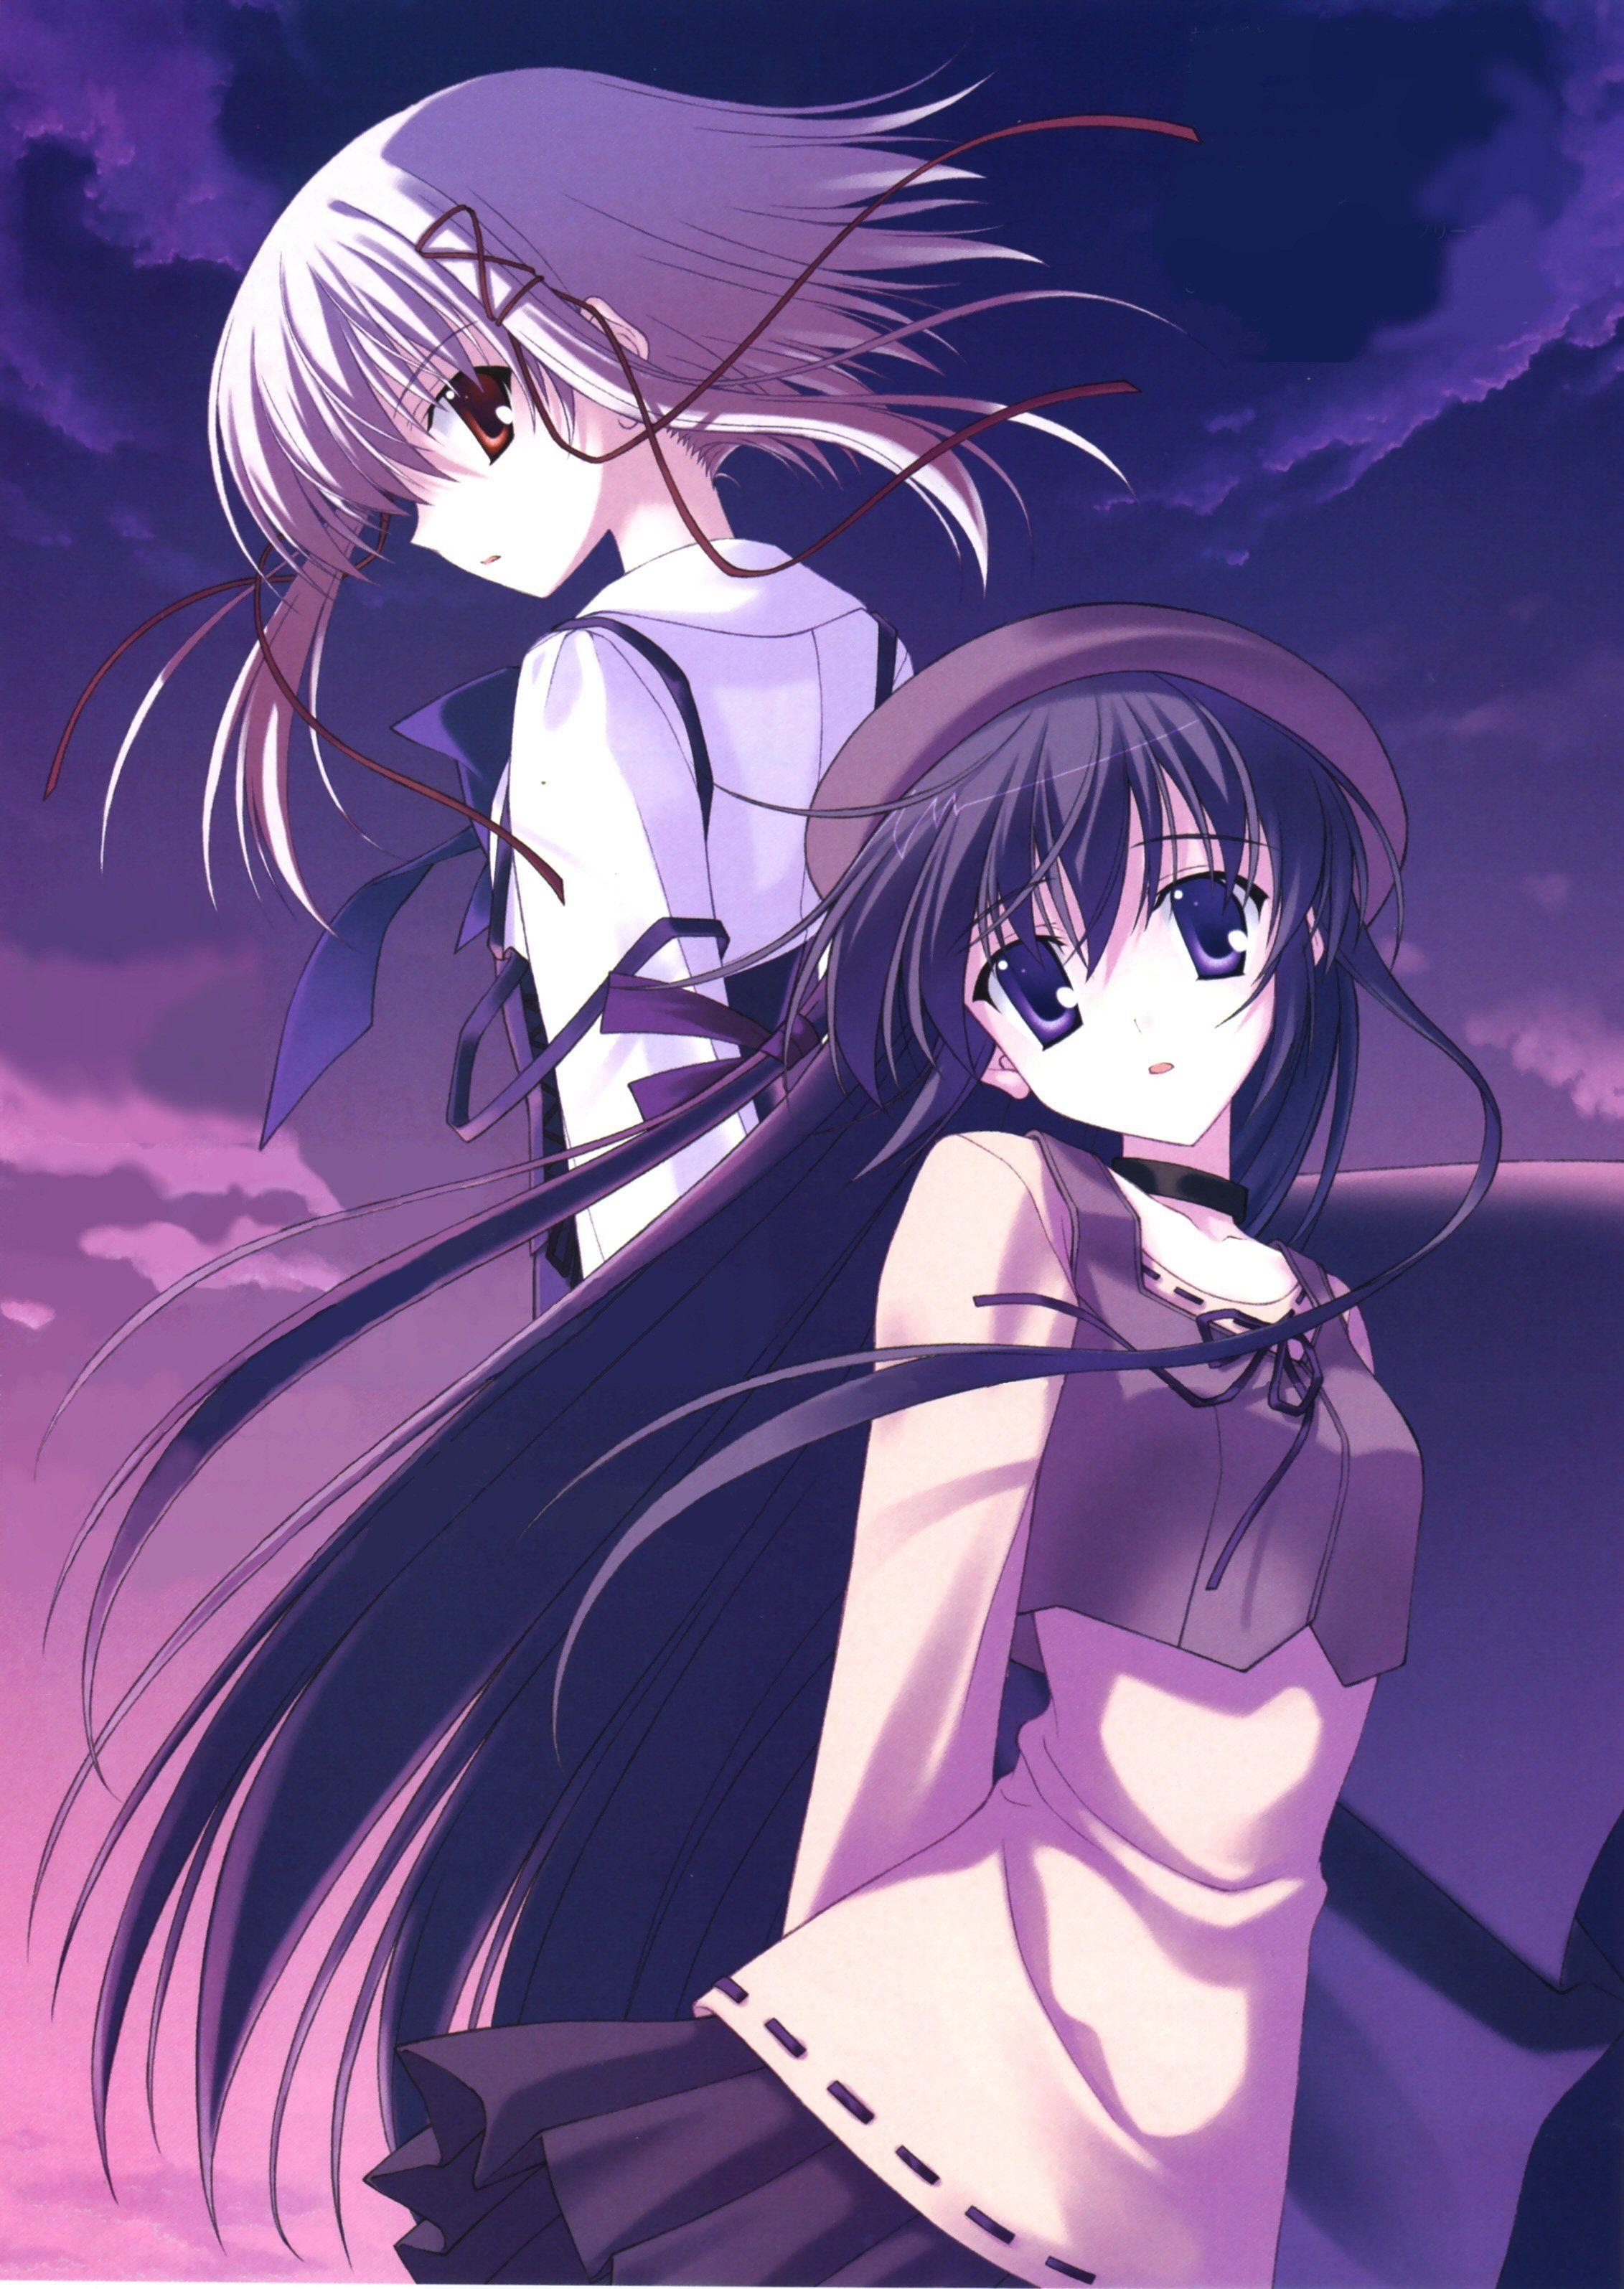 Wallpaper Anime Sola